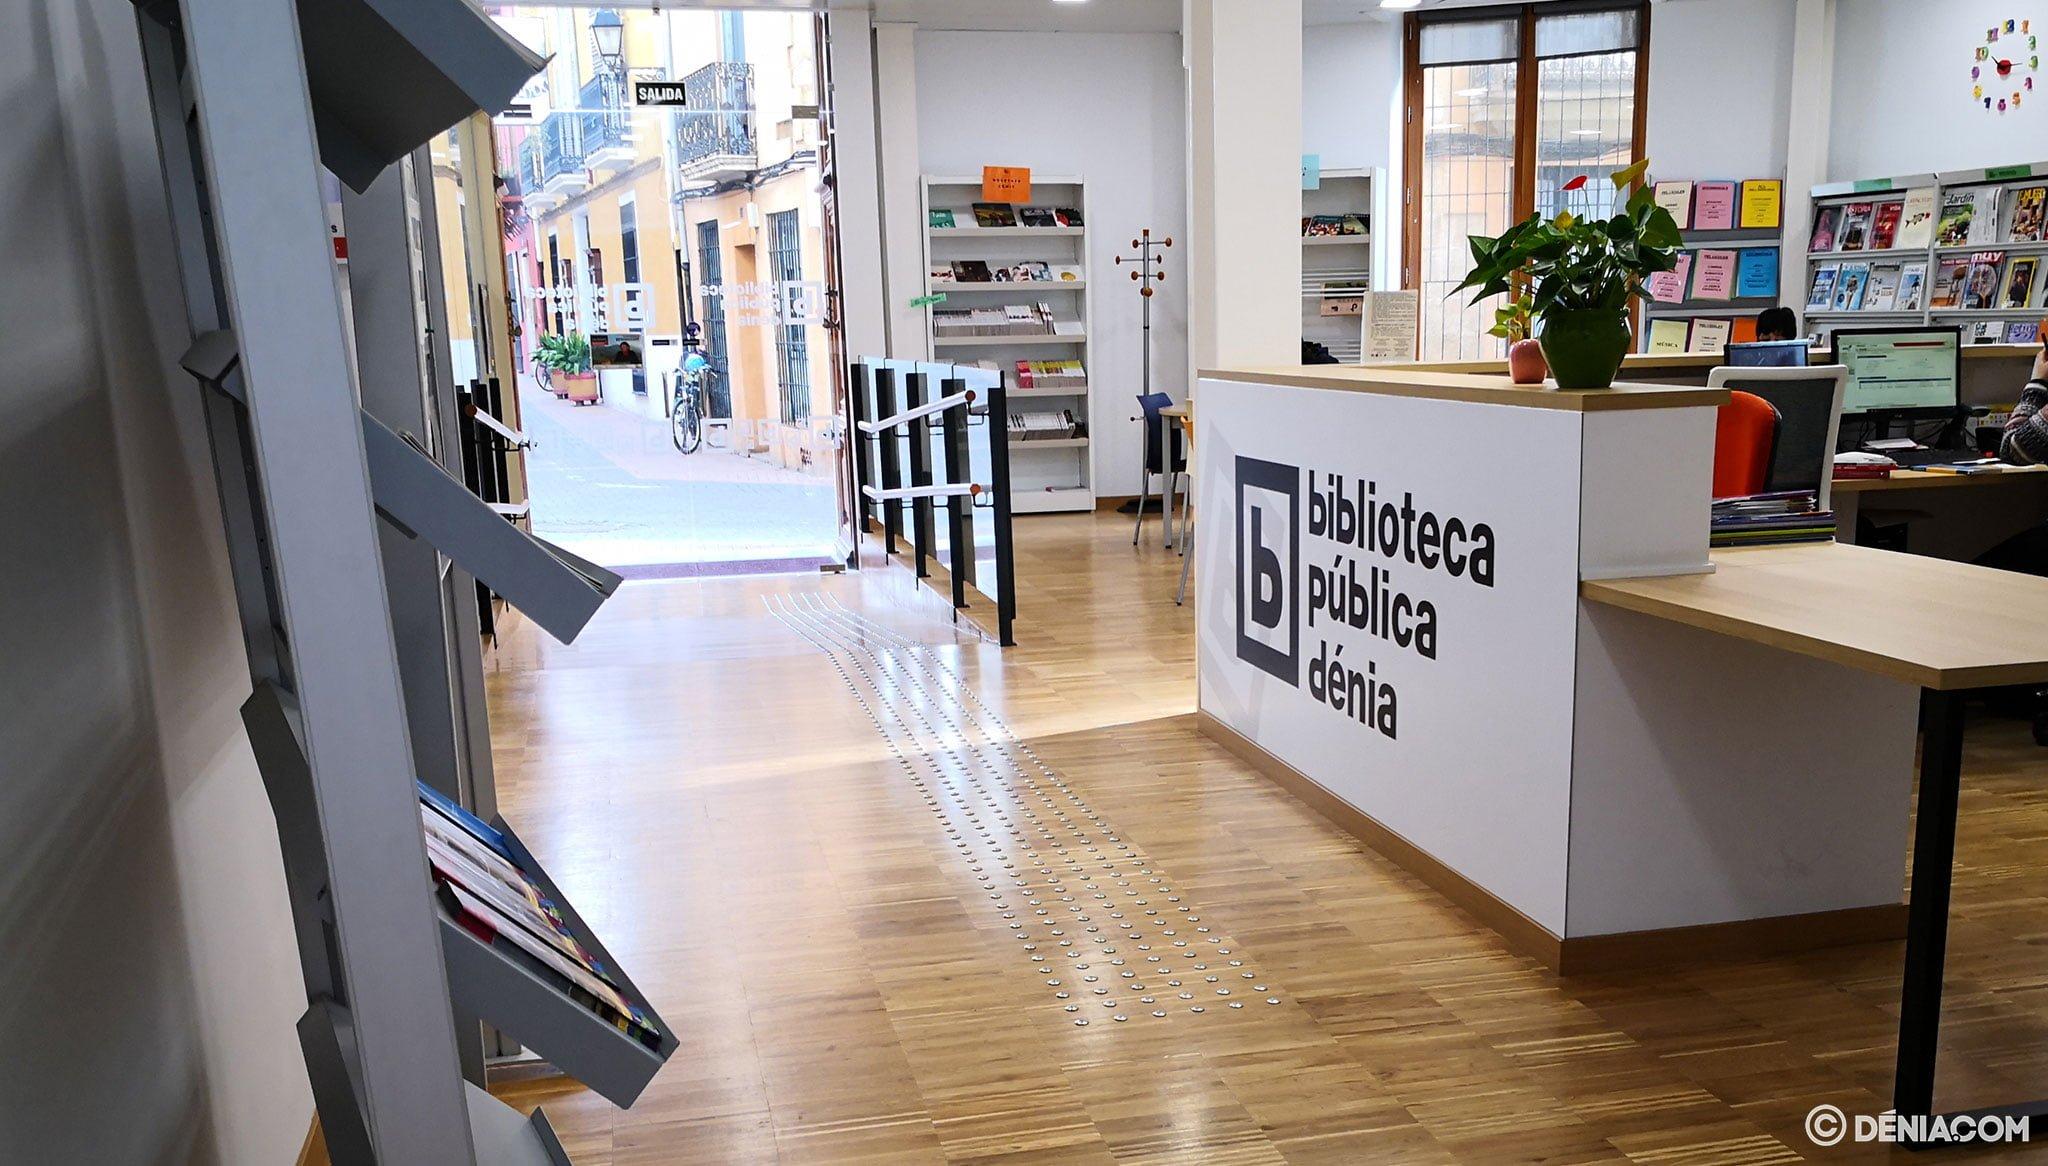 Hall de entrada a la Biblioteca Municipal de Dénia